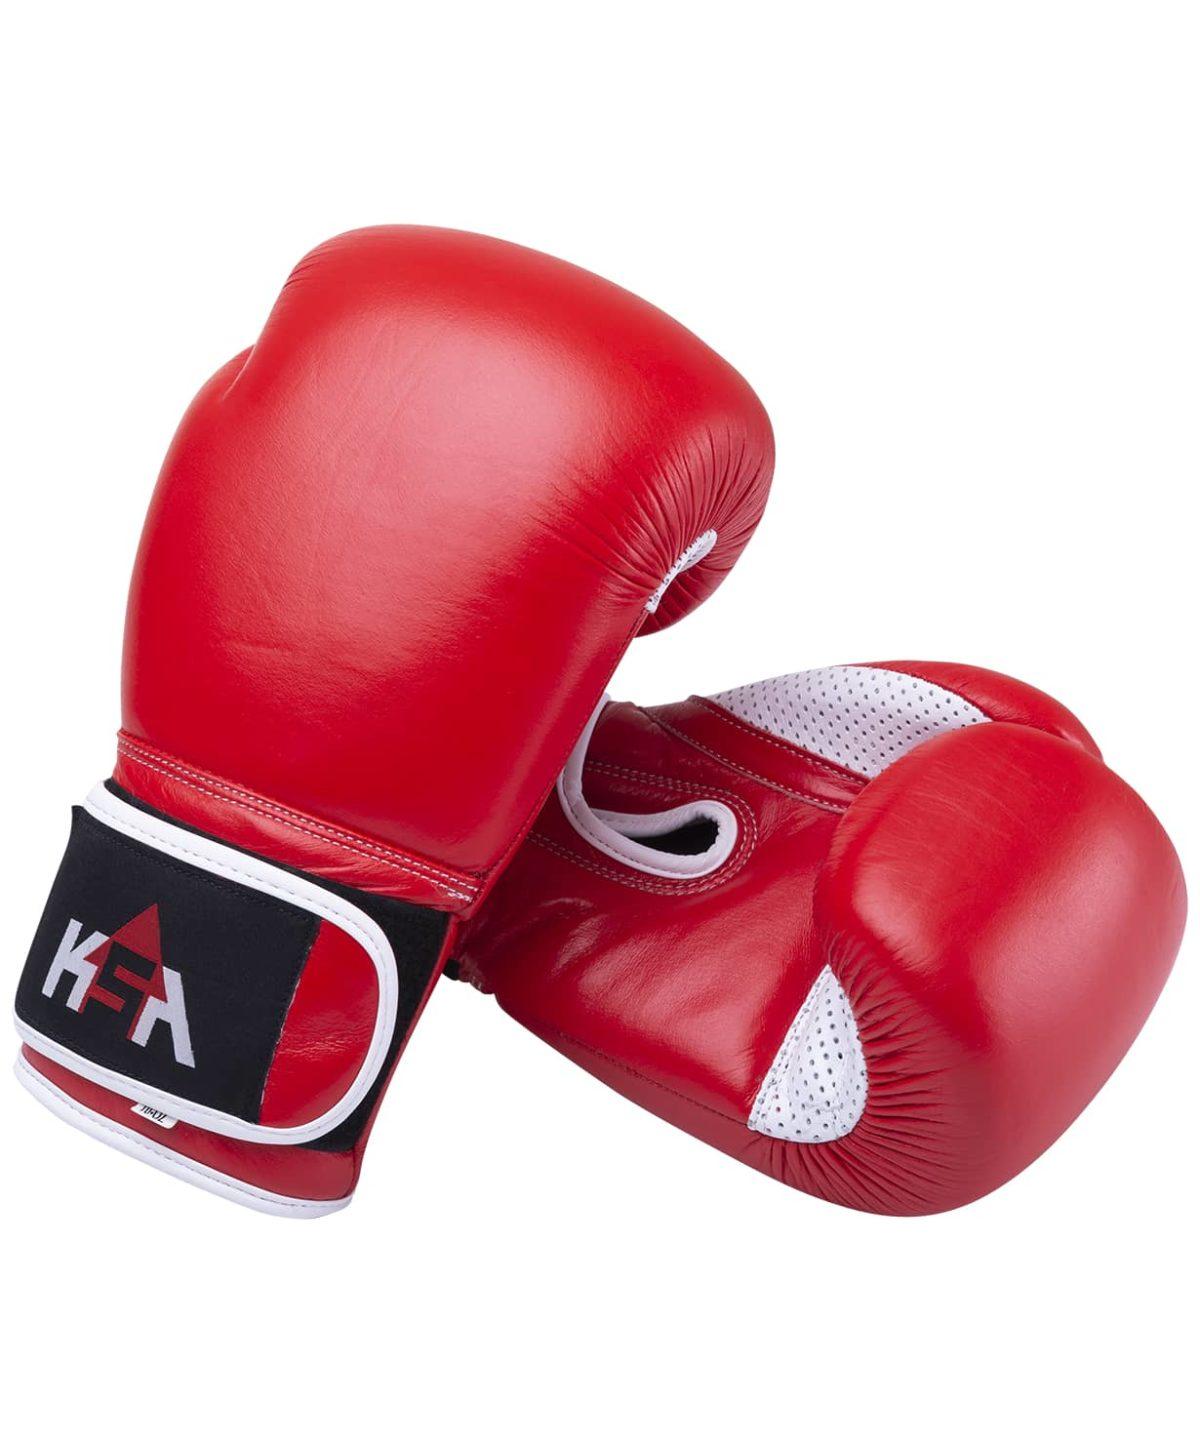 KSA Wolf Red Перчатки боксерские, 12 oz, кожа 17837 - 1